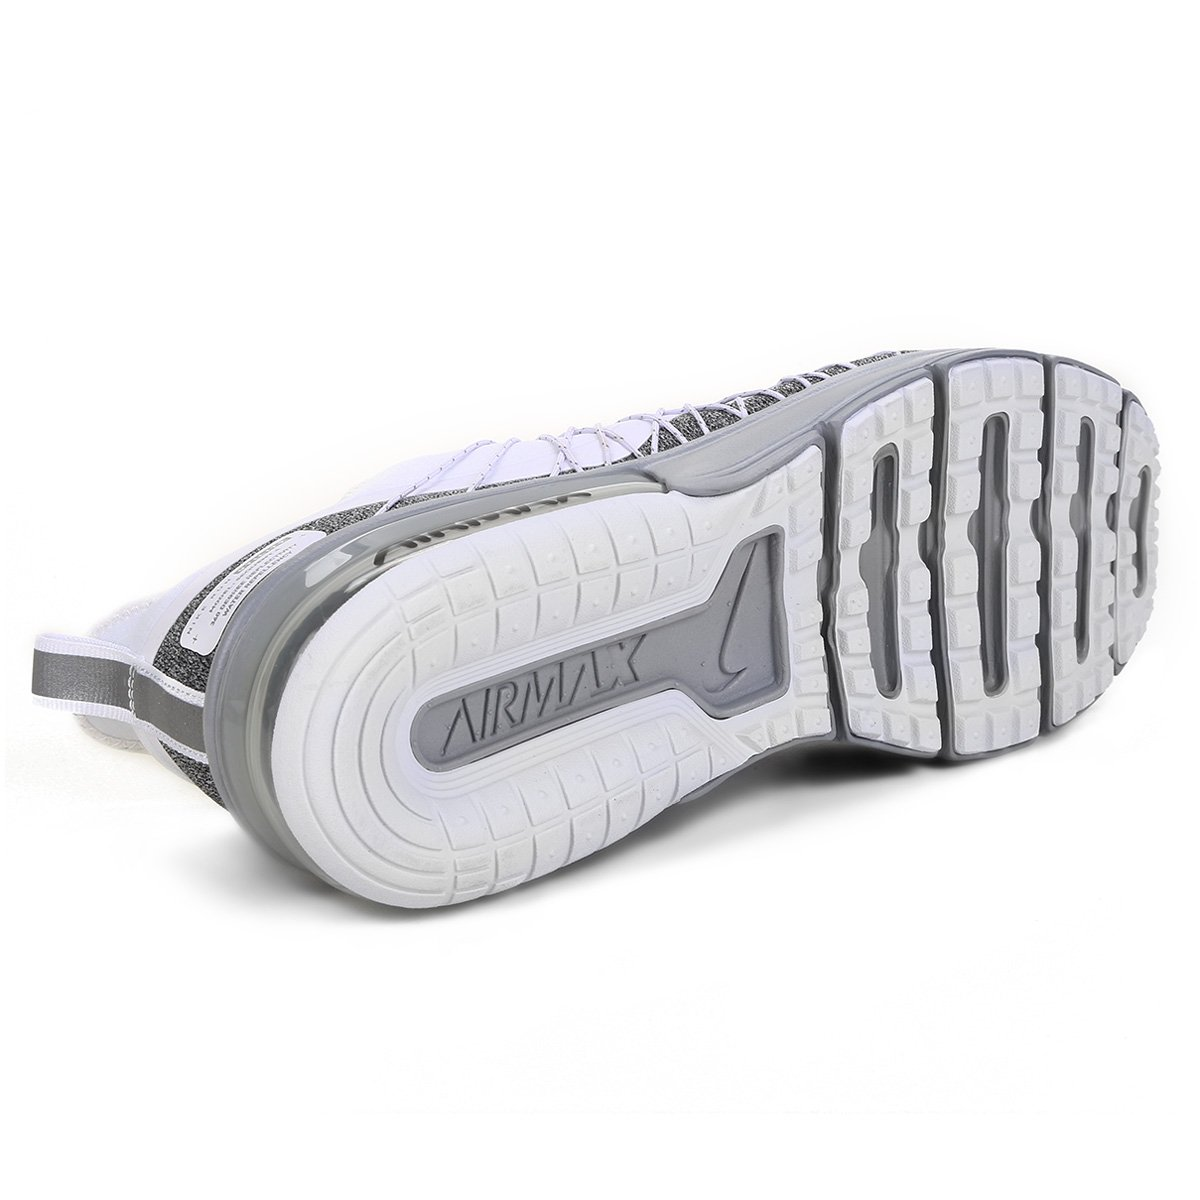 Tênis Nike Air Max Sequent 4 Utility Feminino - Tam: 34 - 3